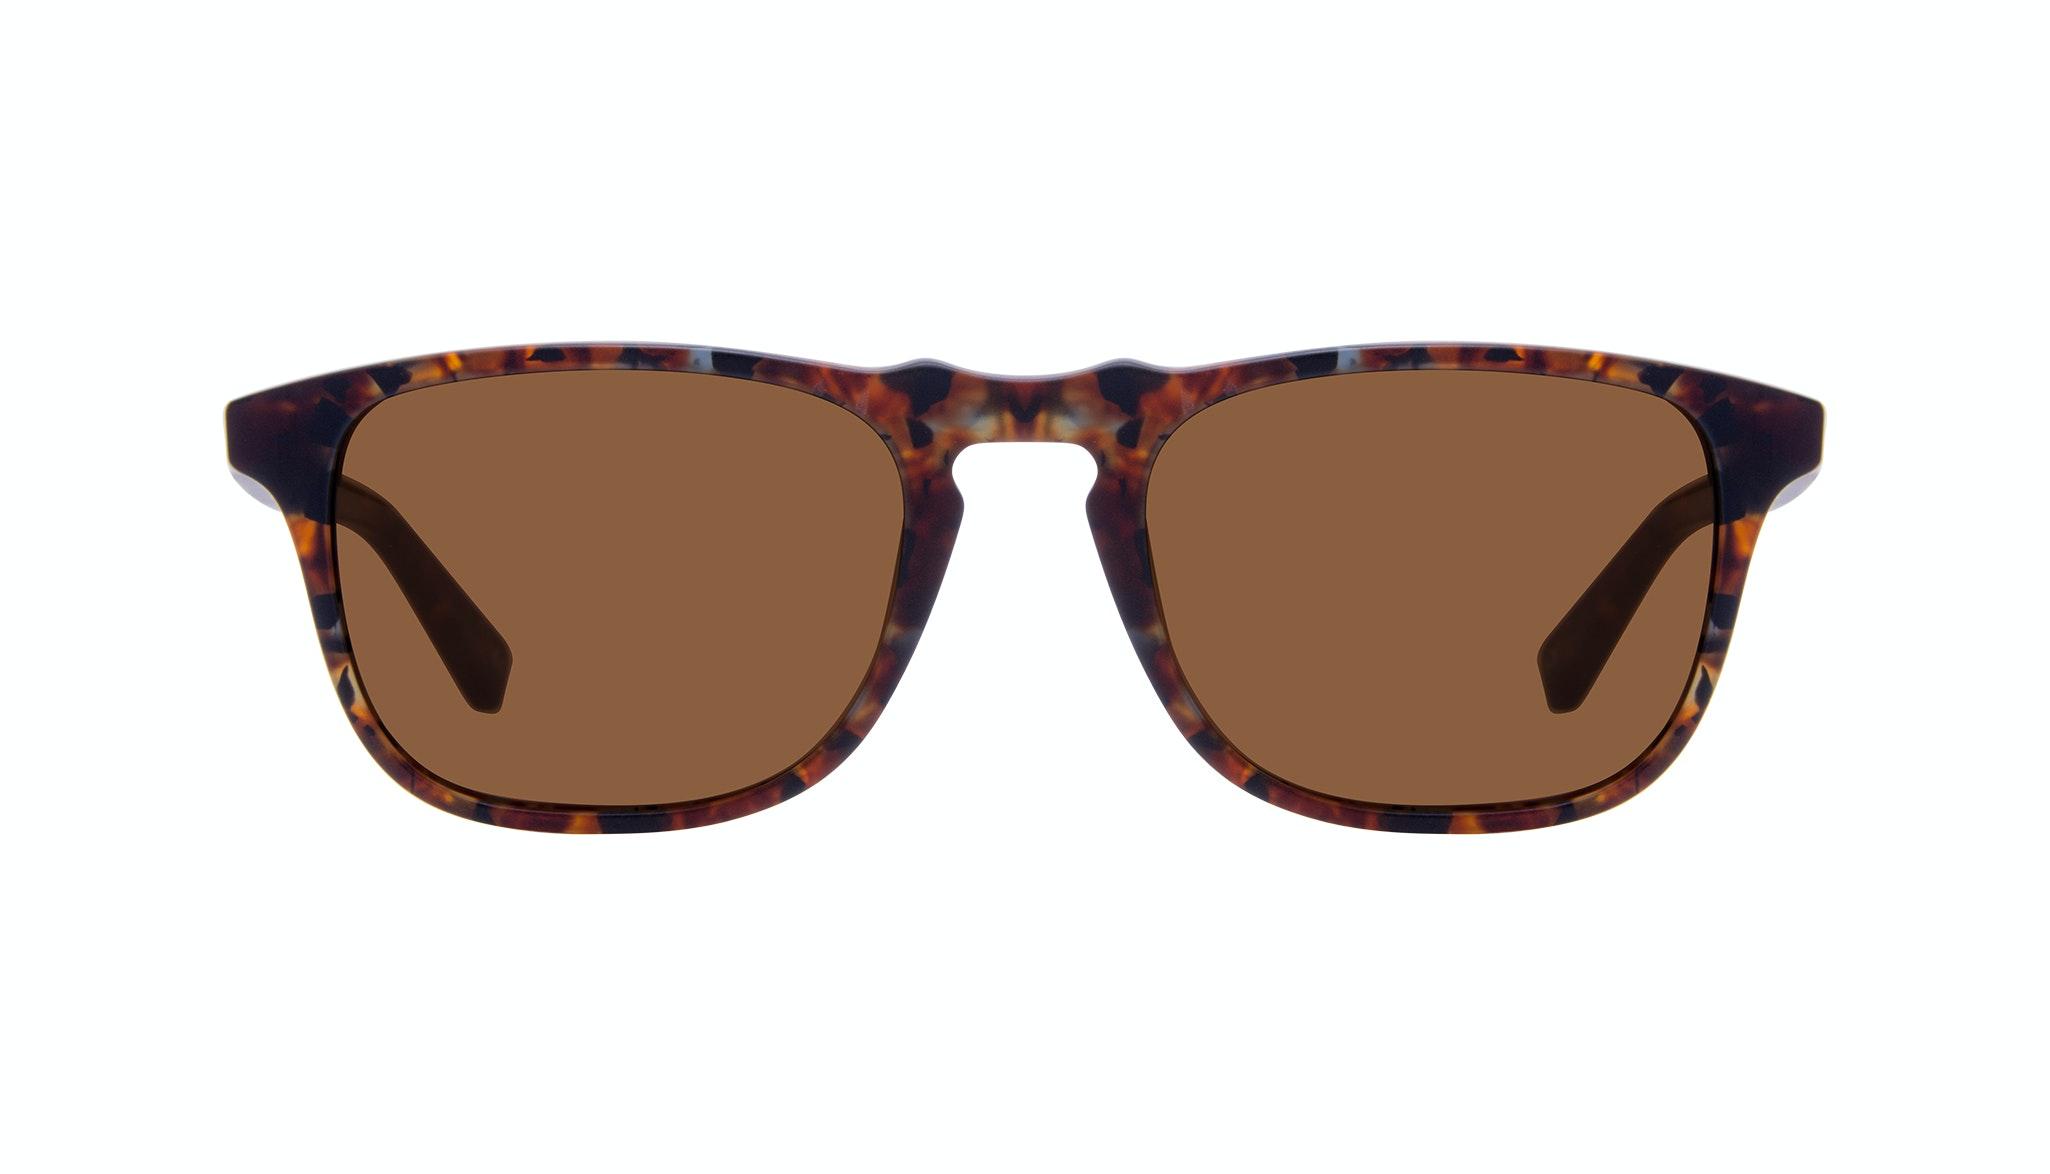 Affordable Fashion Glasses Rectangle Sunglasses Men Dare Mahogany